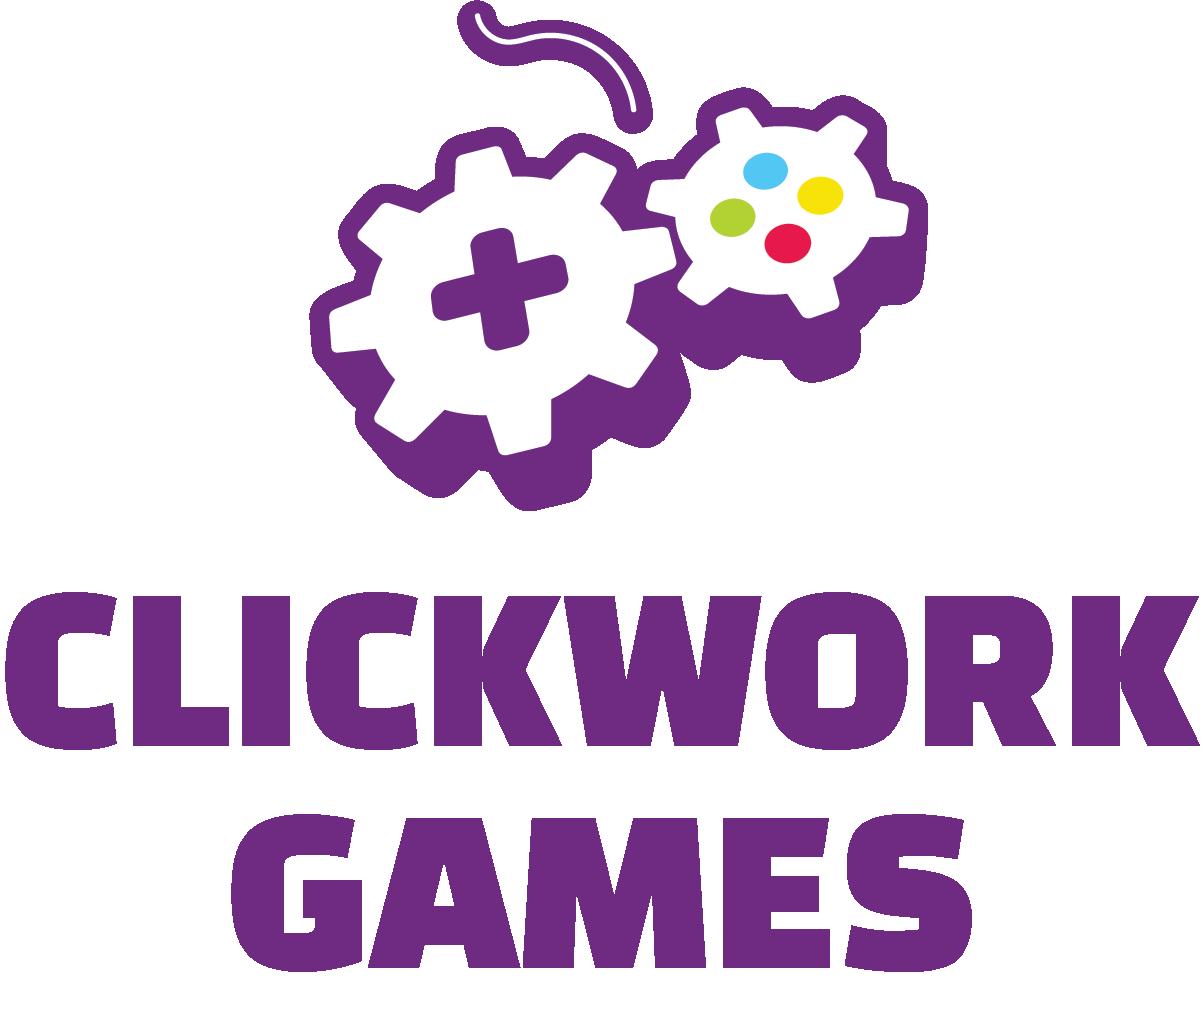 Clickwork Games